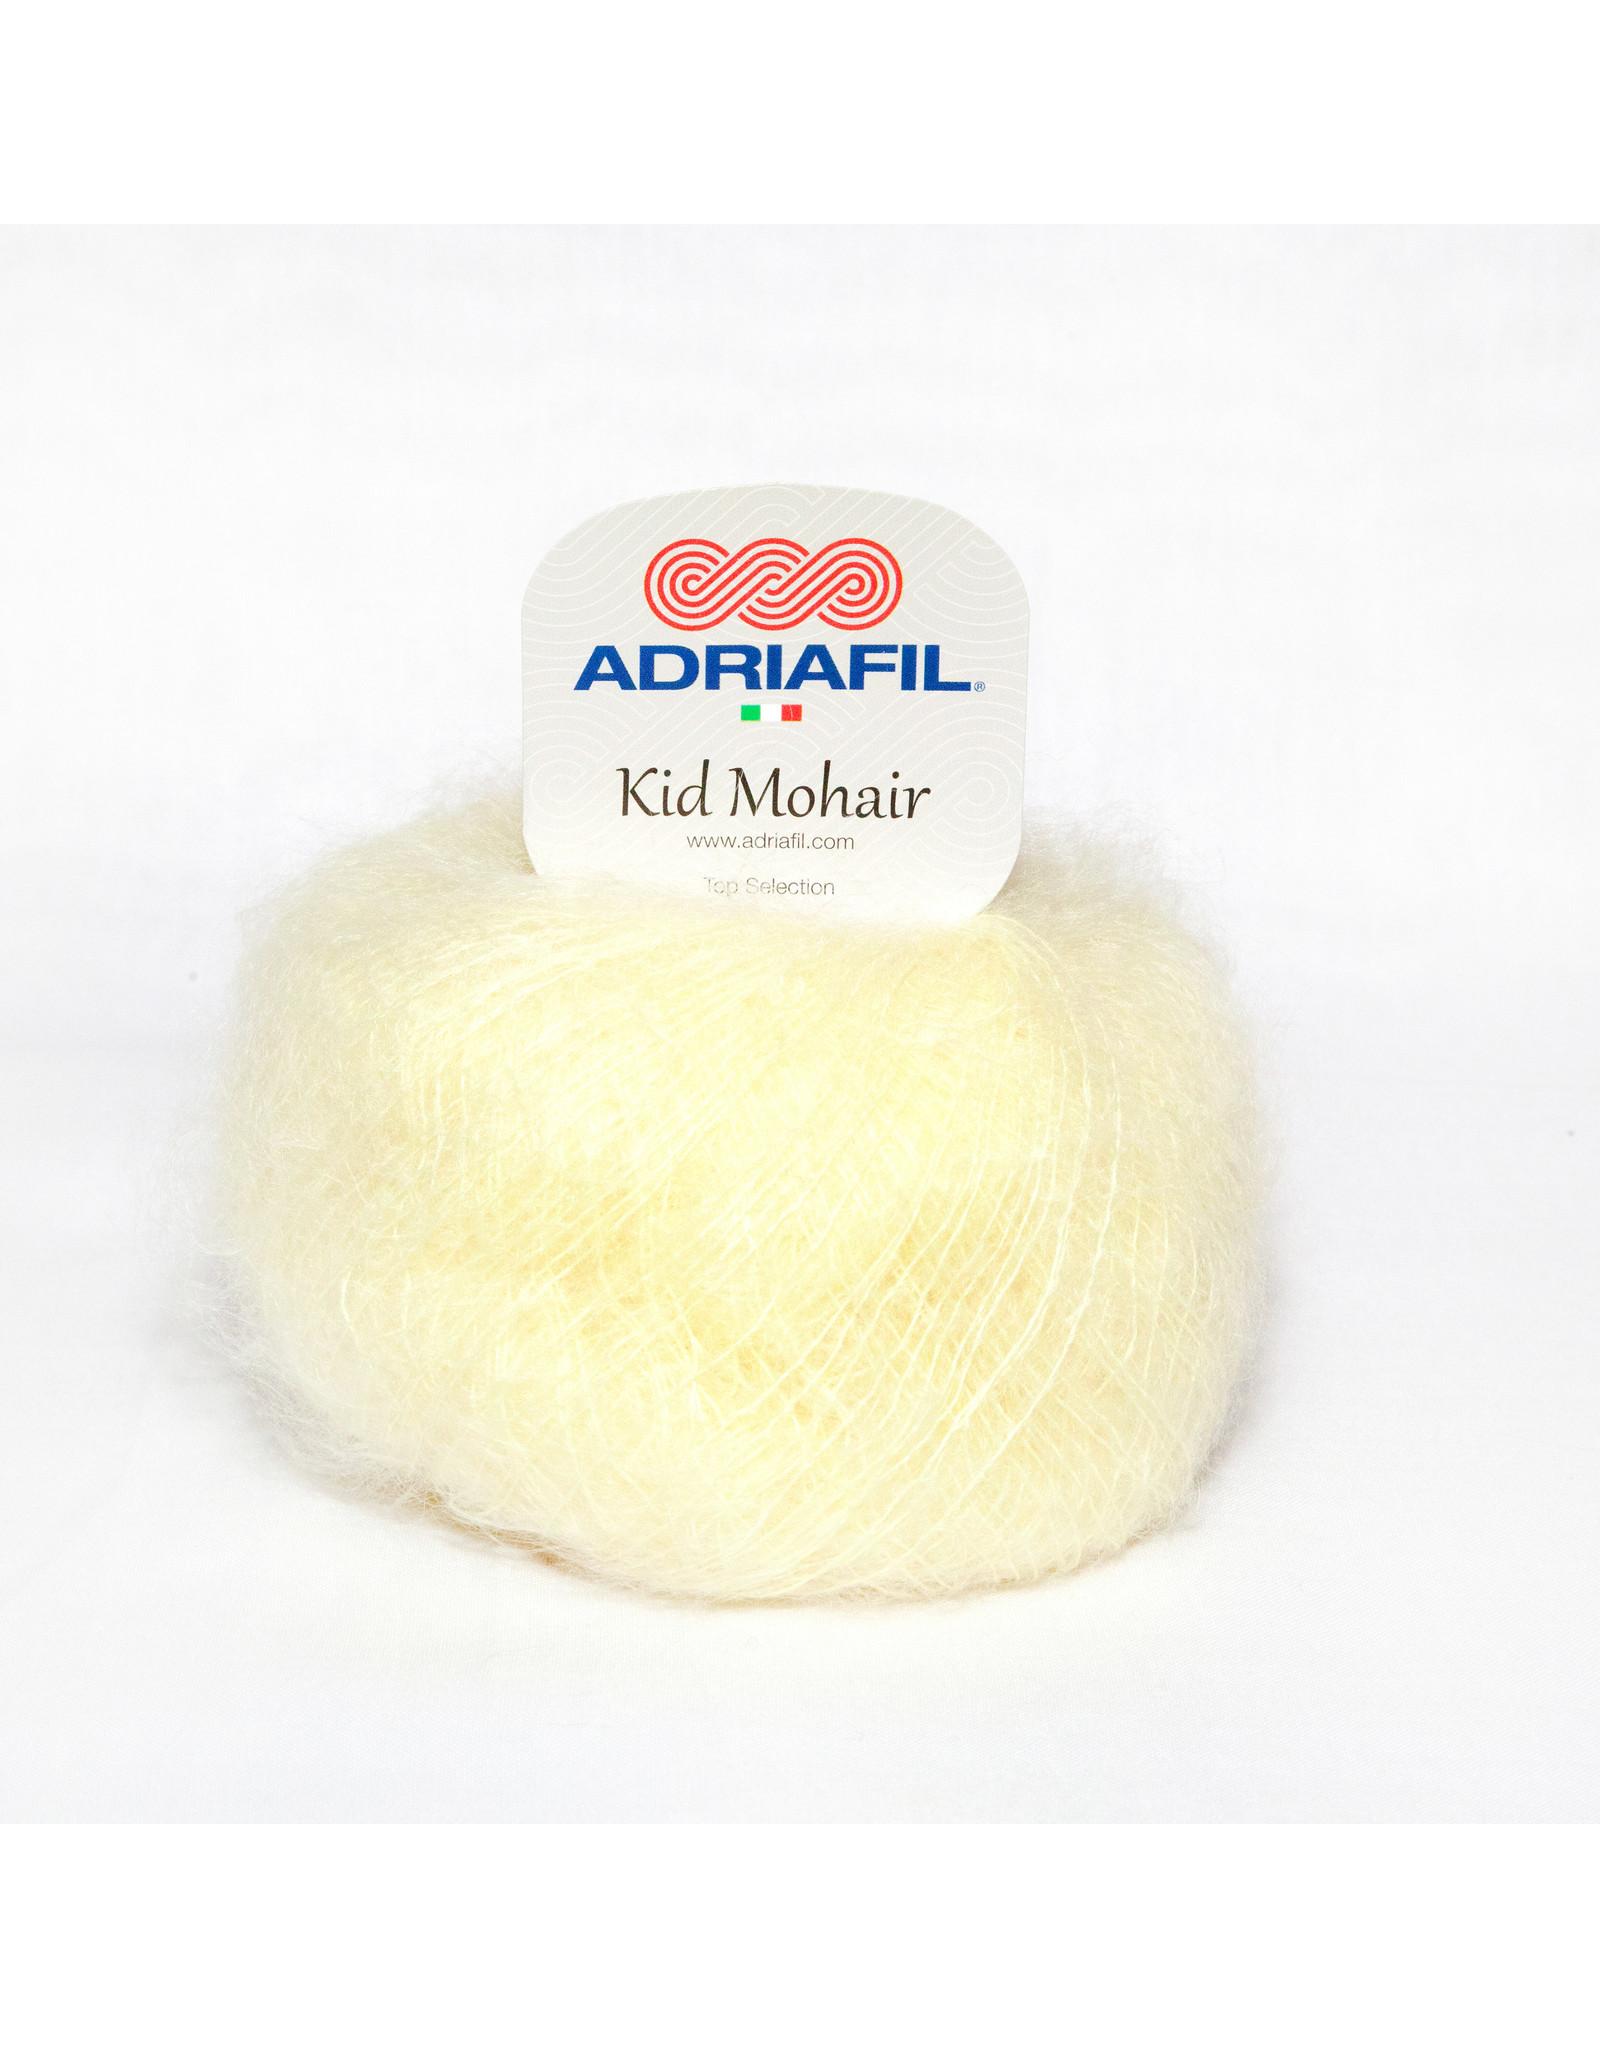 Adriafil Adriafil Kid Mohair